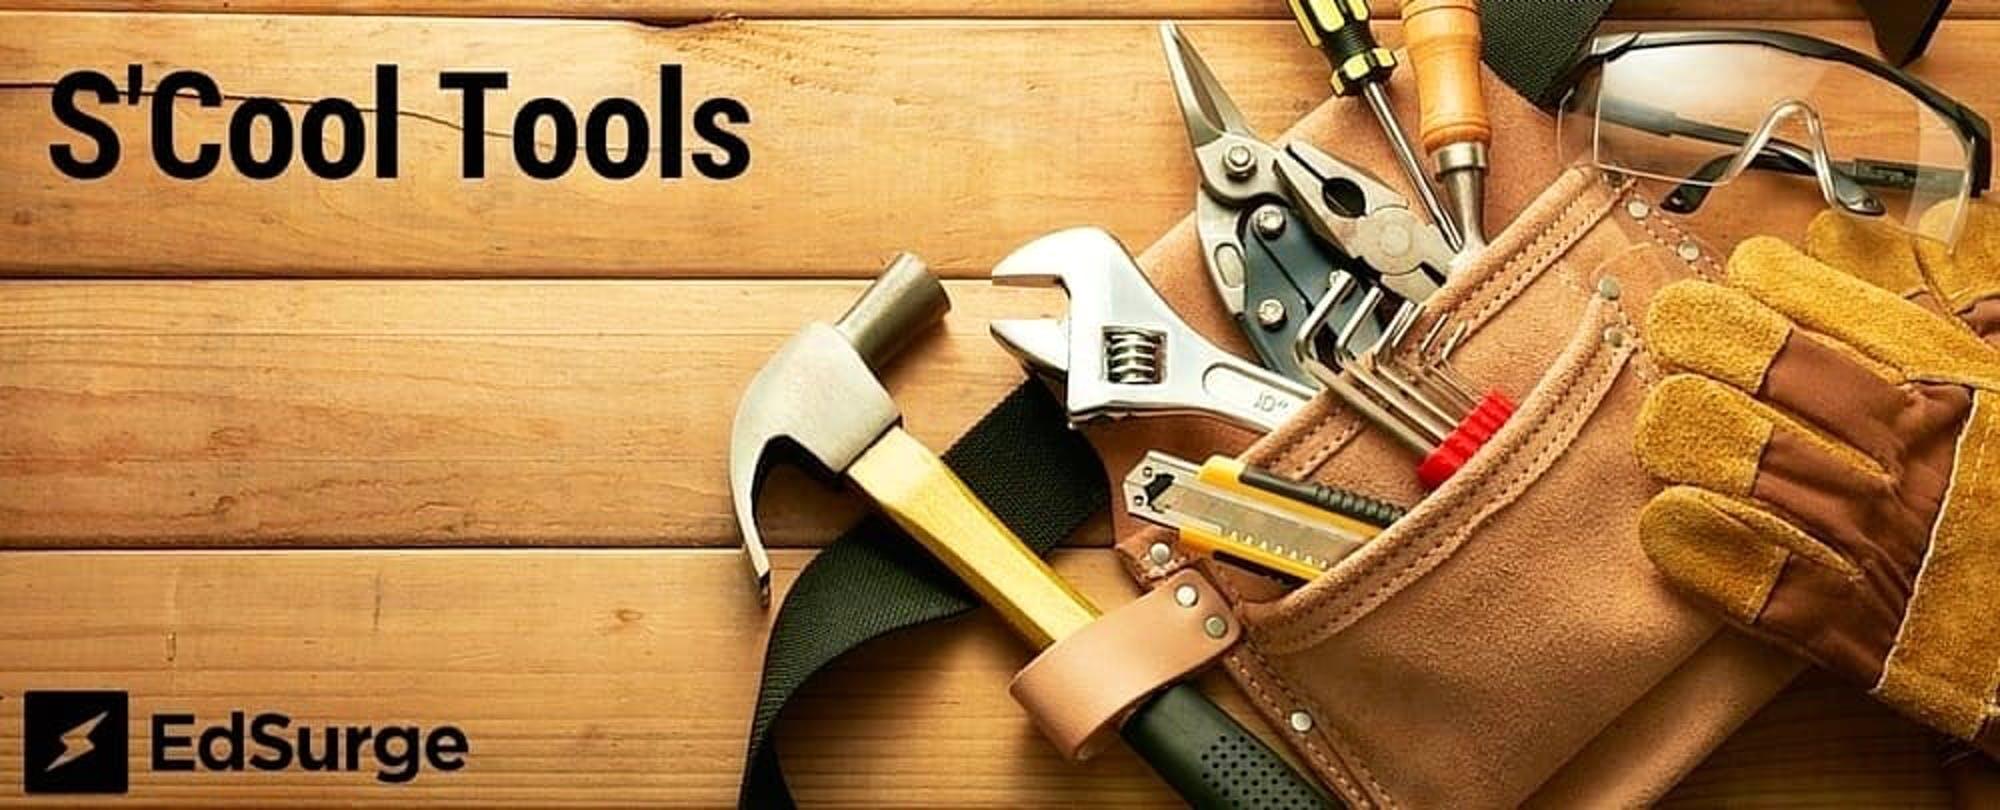 S'Cool Tools, Teacher Voice Edition: Raz-Kids, Big Universe, CodeSpell